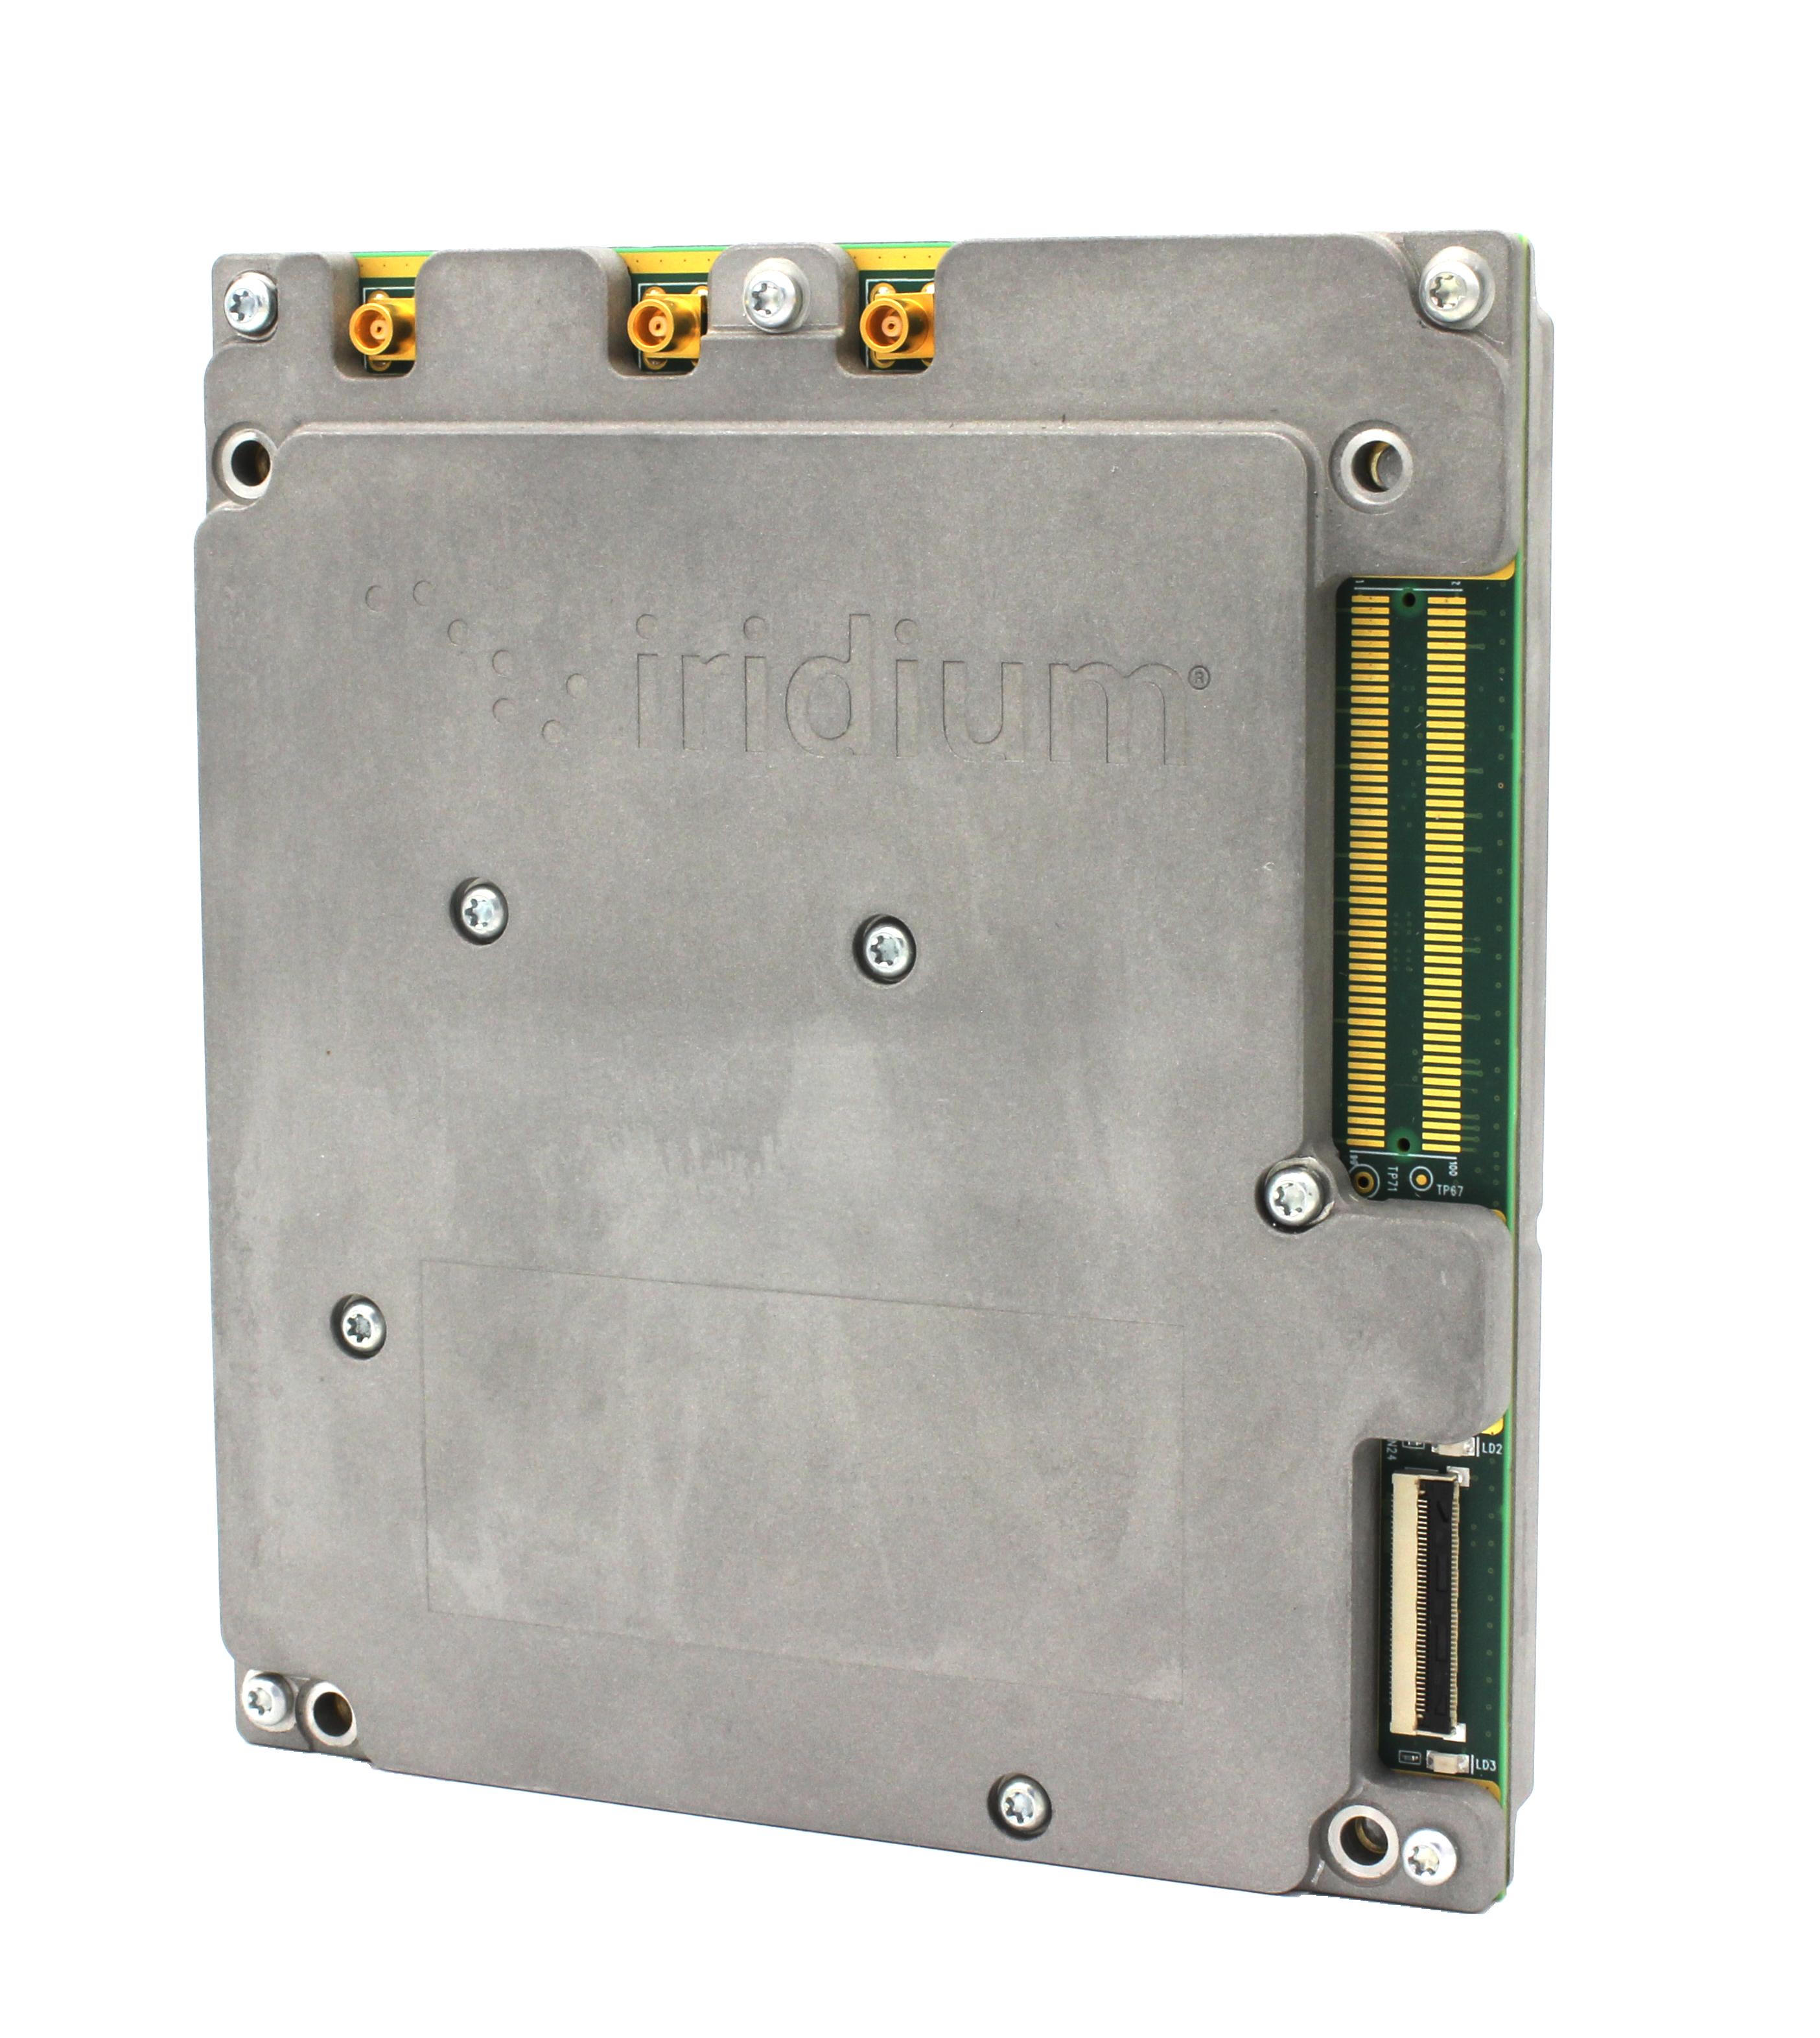 Iridium Certus 9810 Product Image